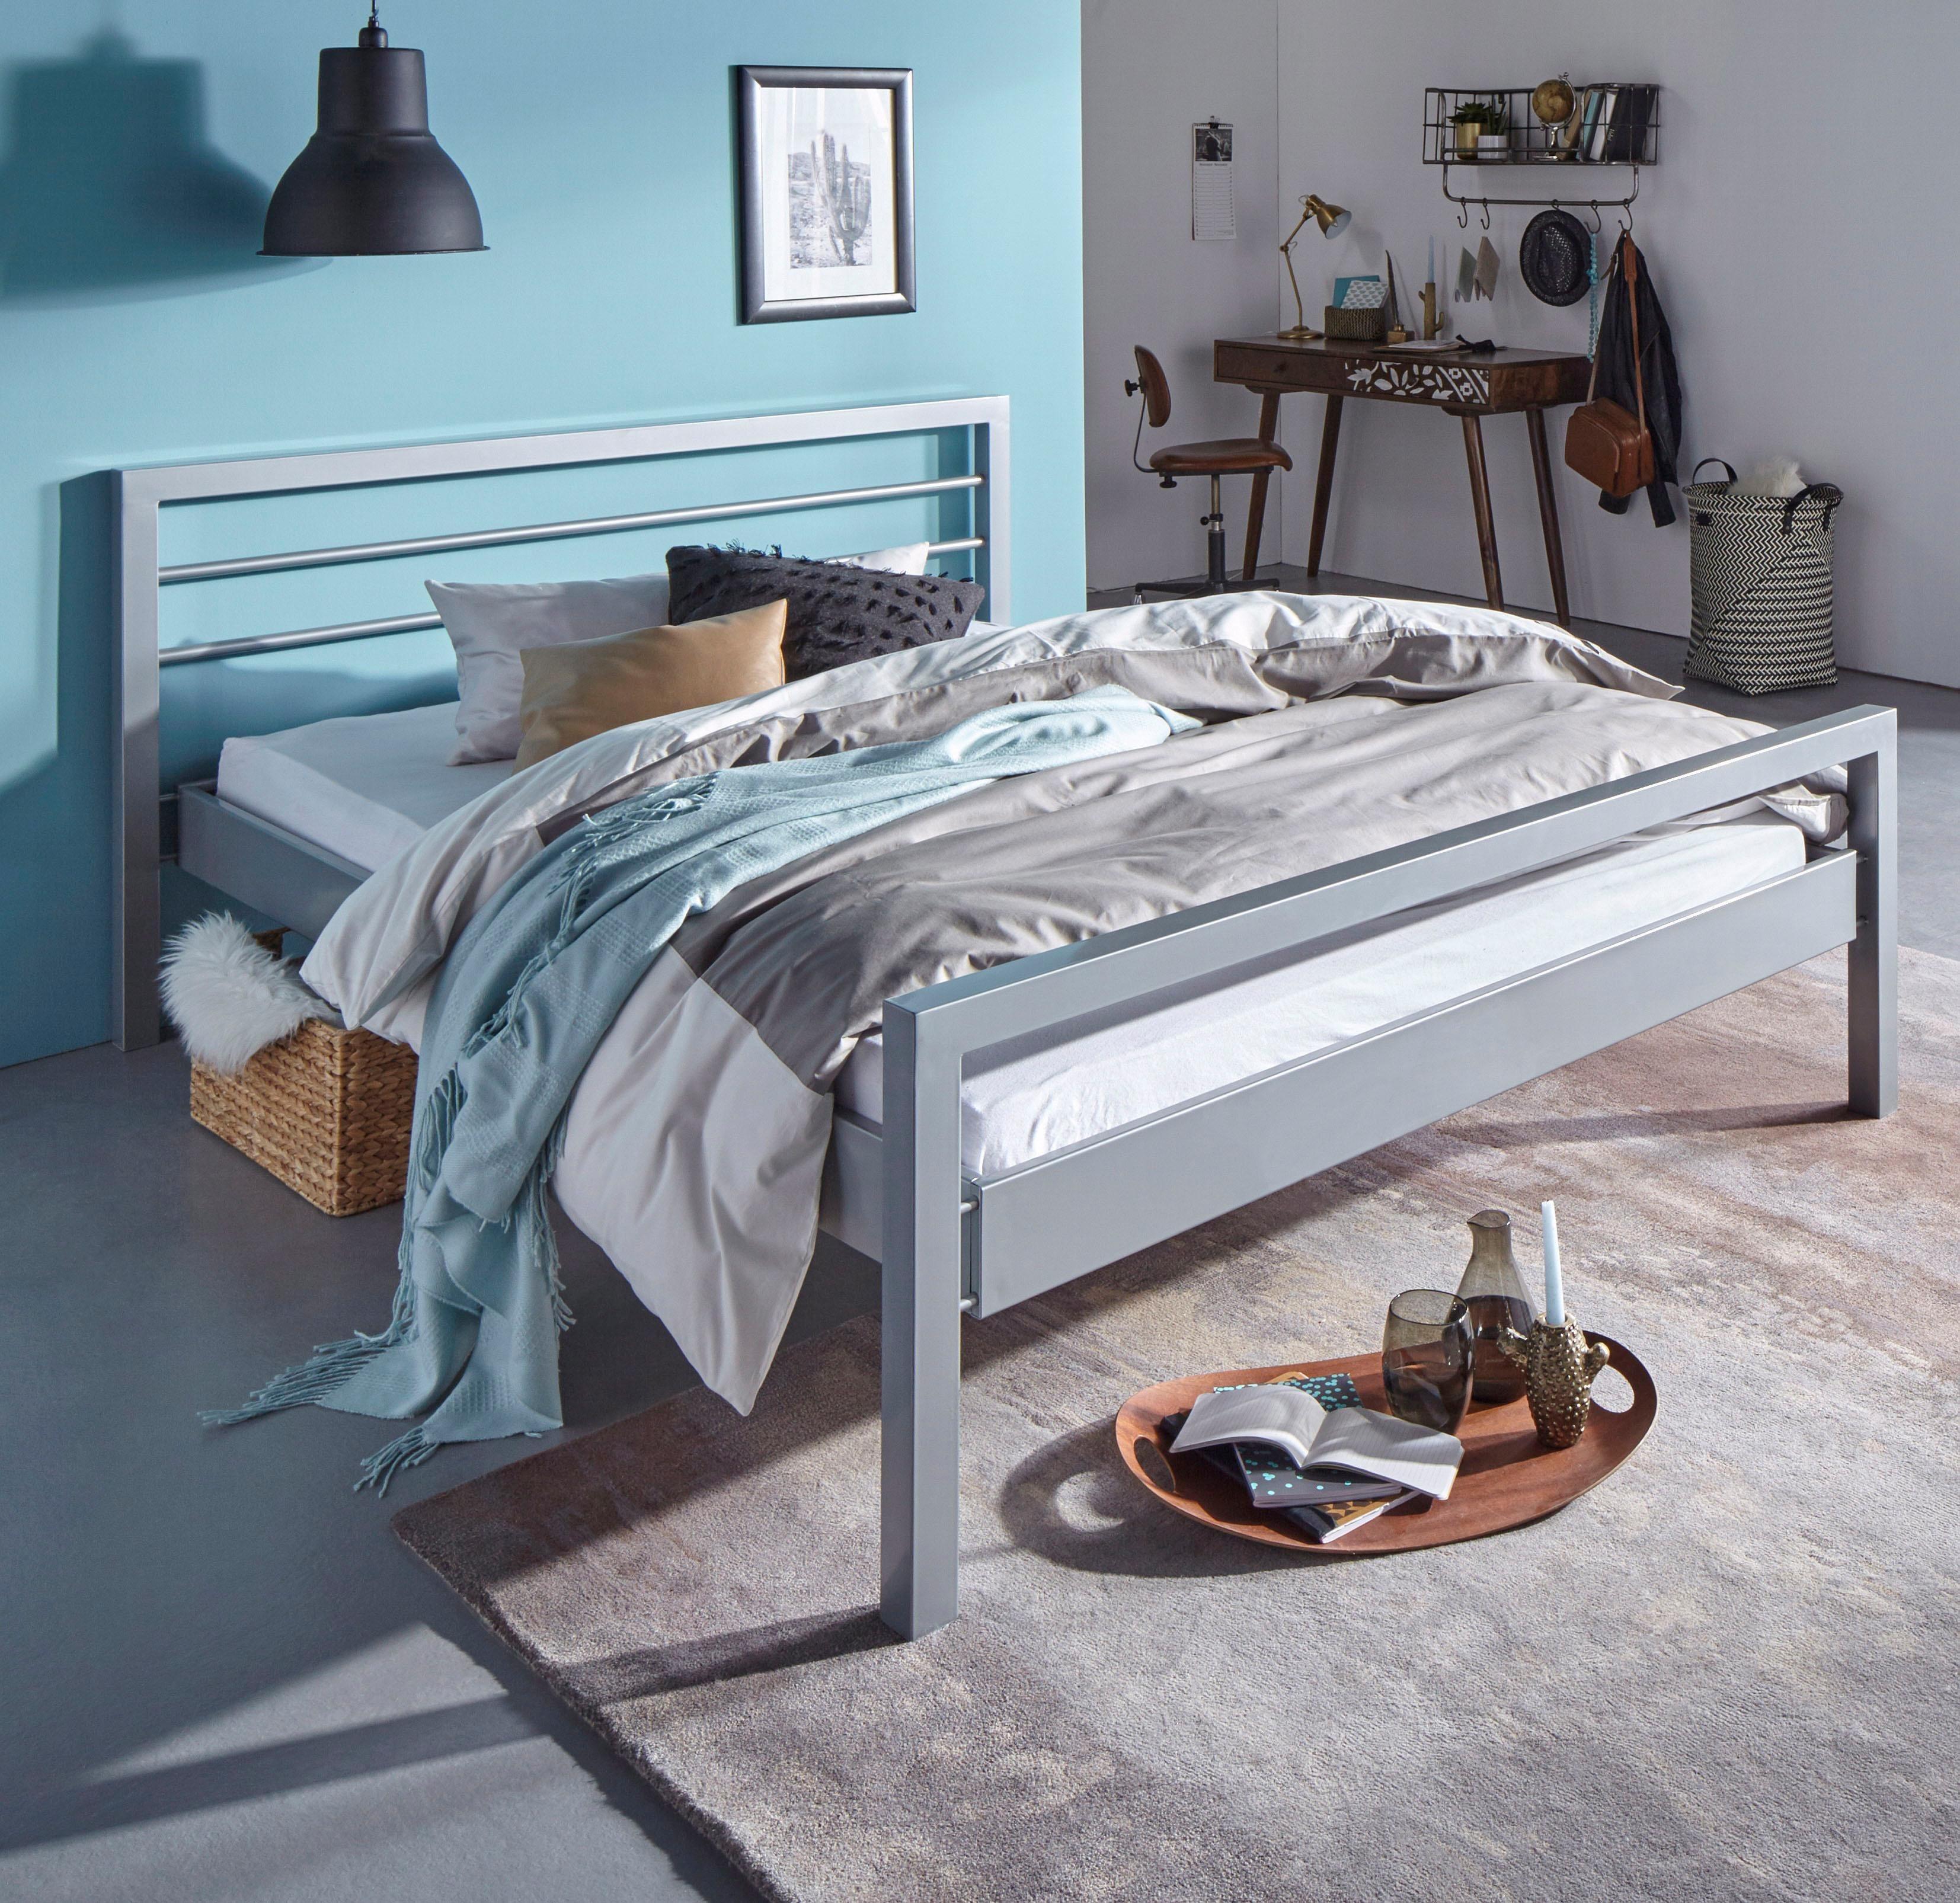 Atlantic Home Collection Metallbett | Schlafzimmer > Betten > Metallbetten | ATLANTIC home collection